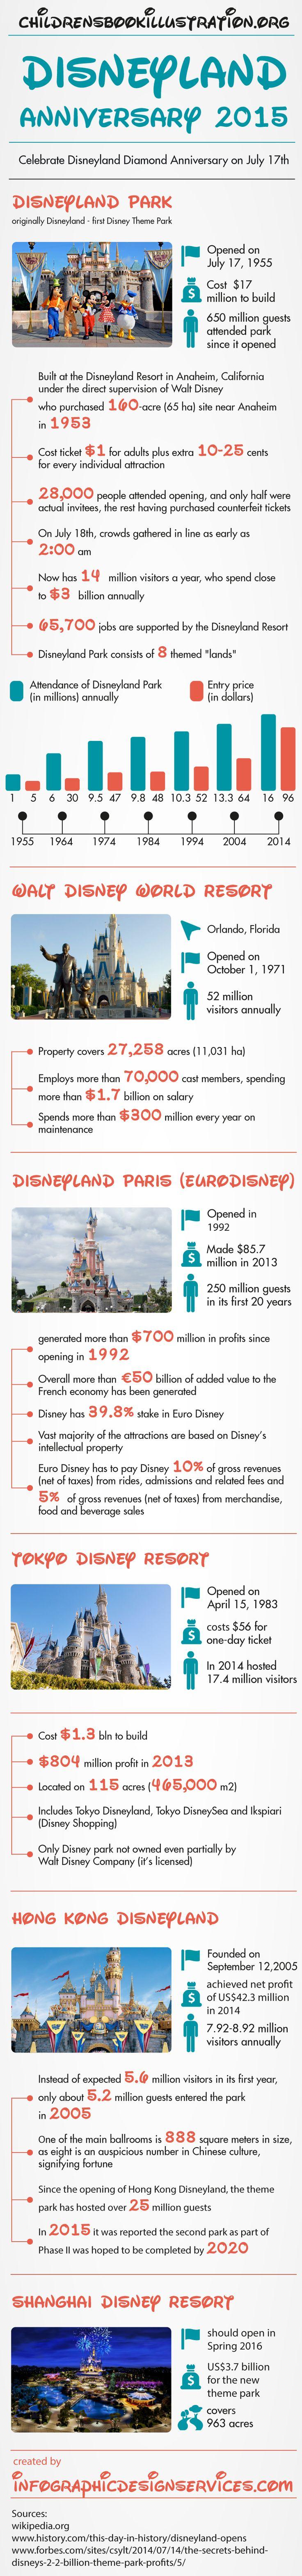 Disneyland Anniversary 2015 - Disney Theme Parks #infographic